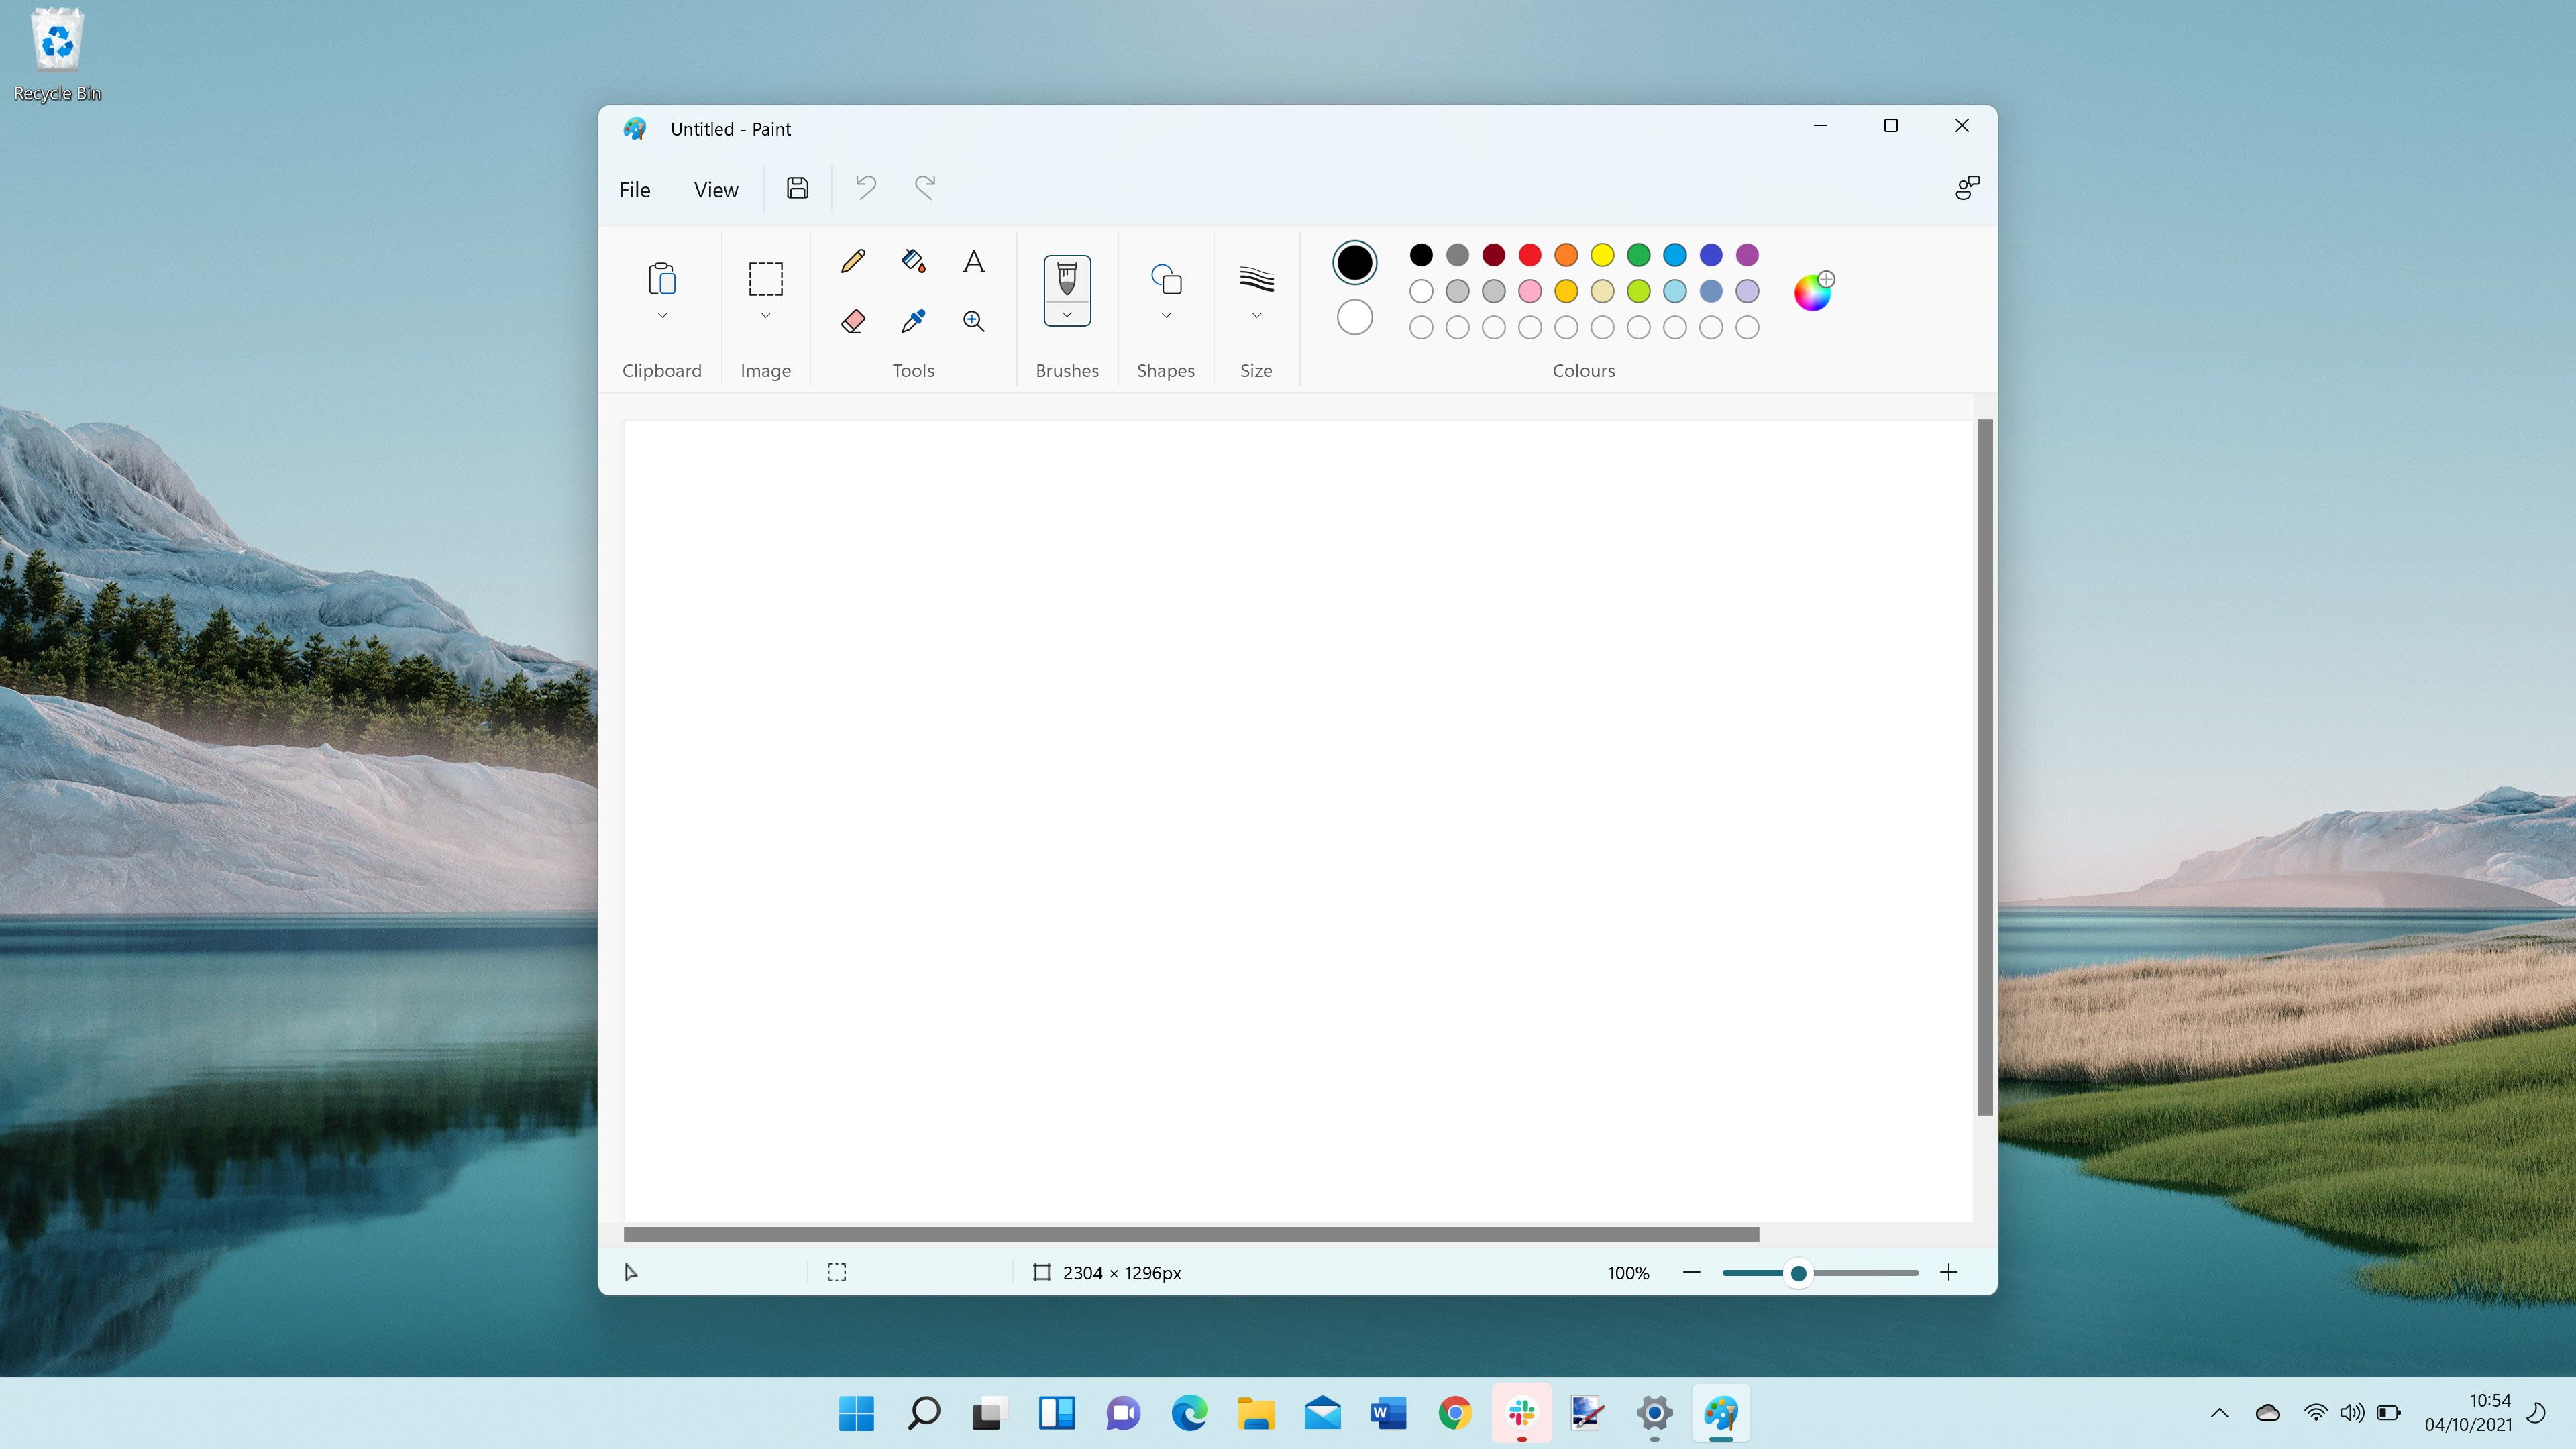 Windows 11 screenshot of the new Paint app